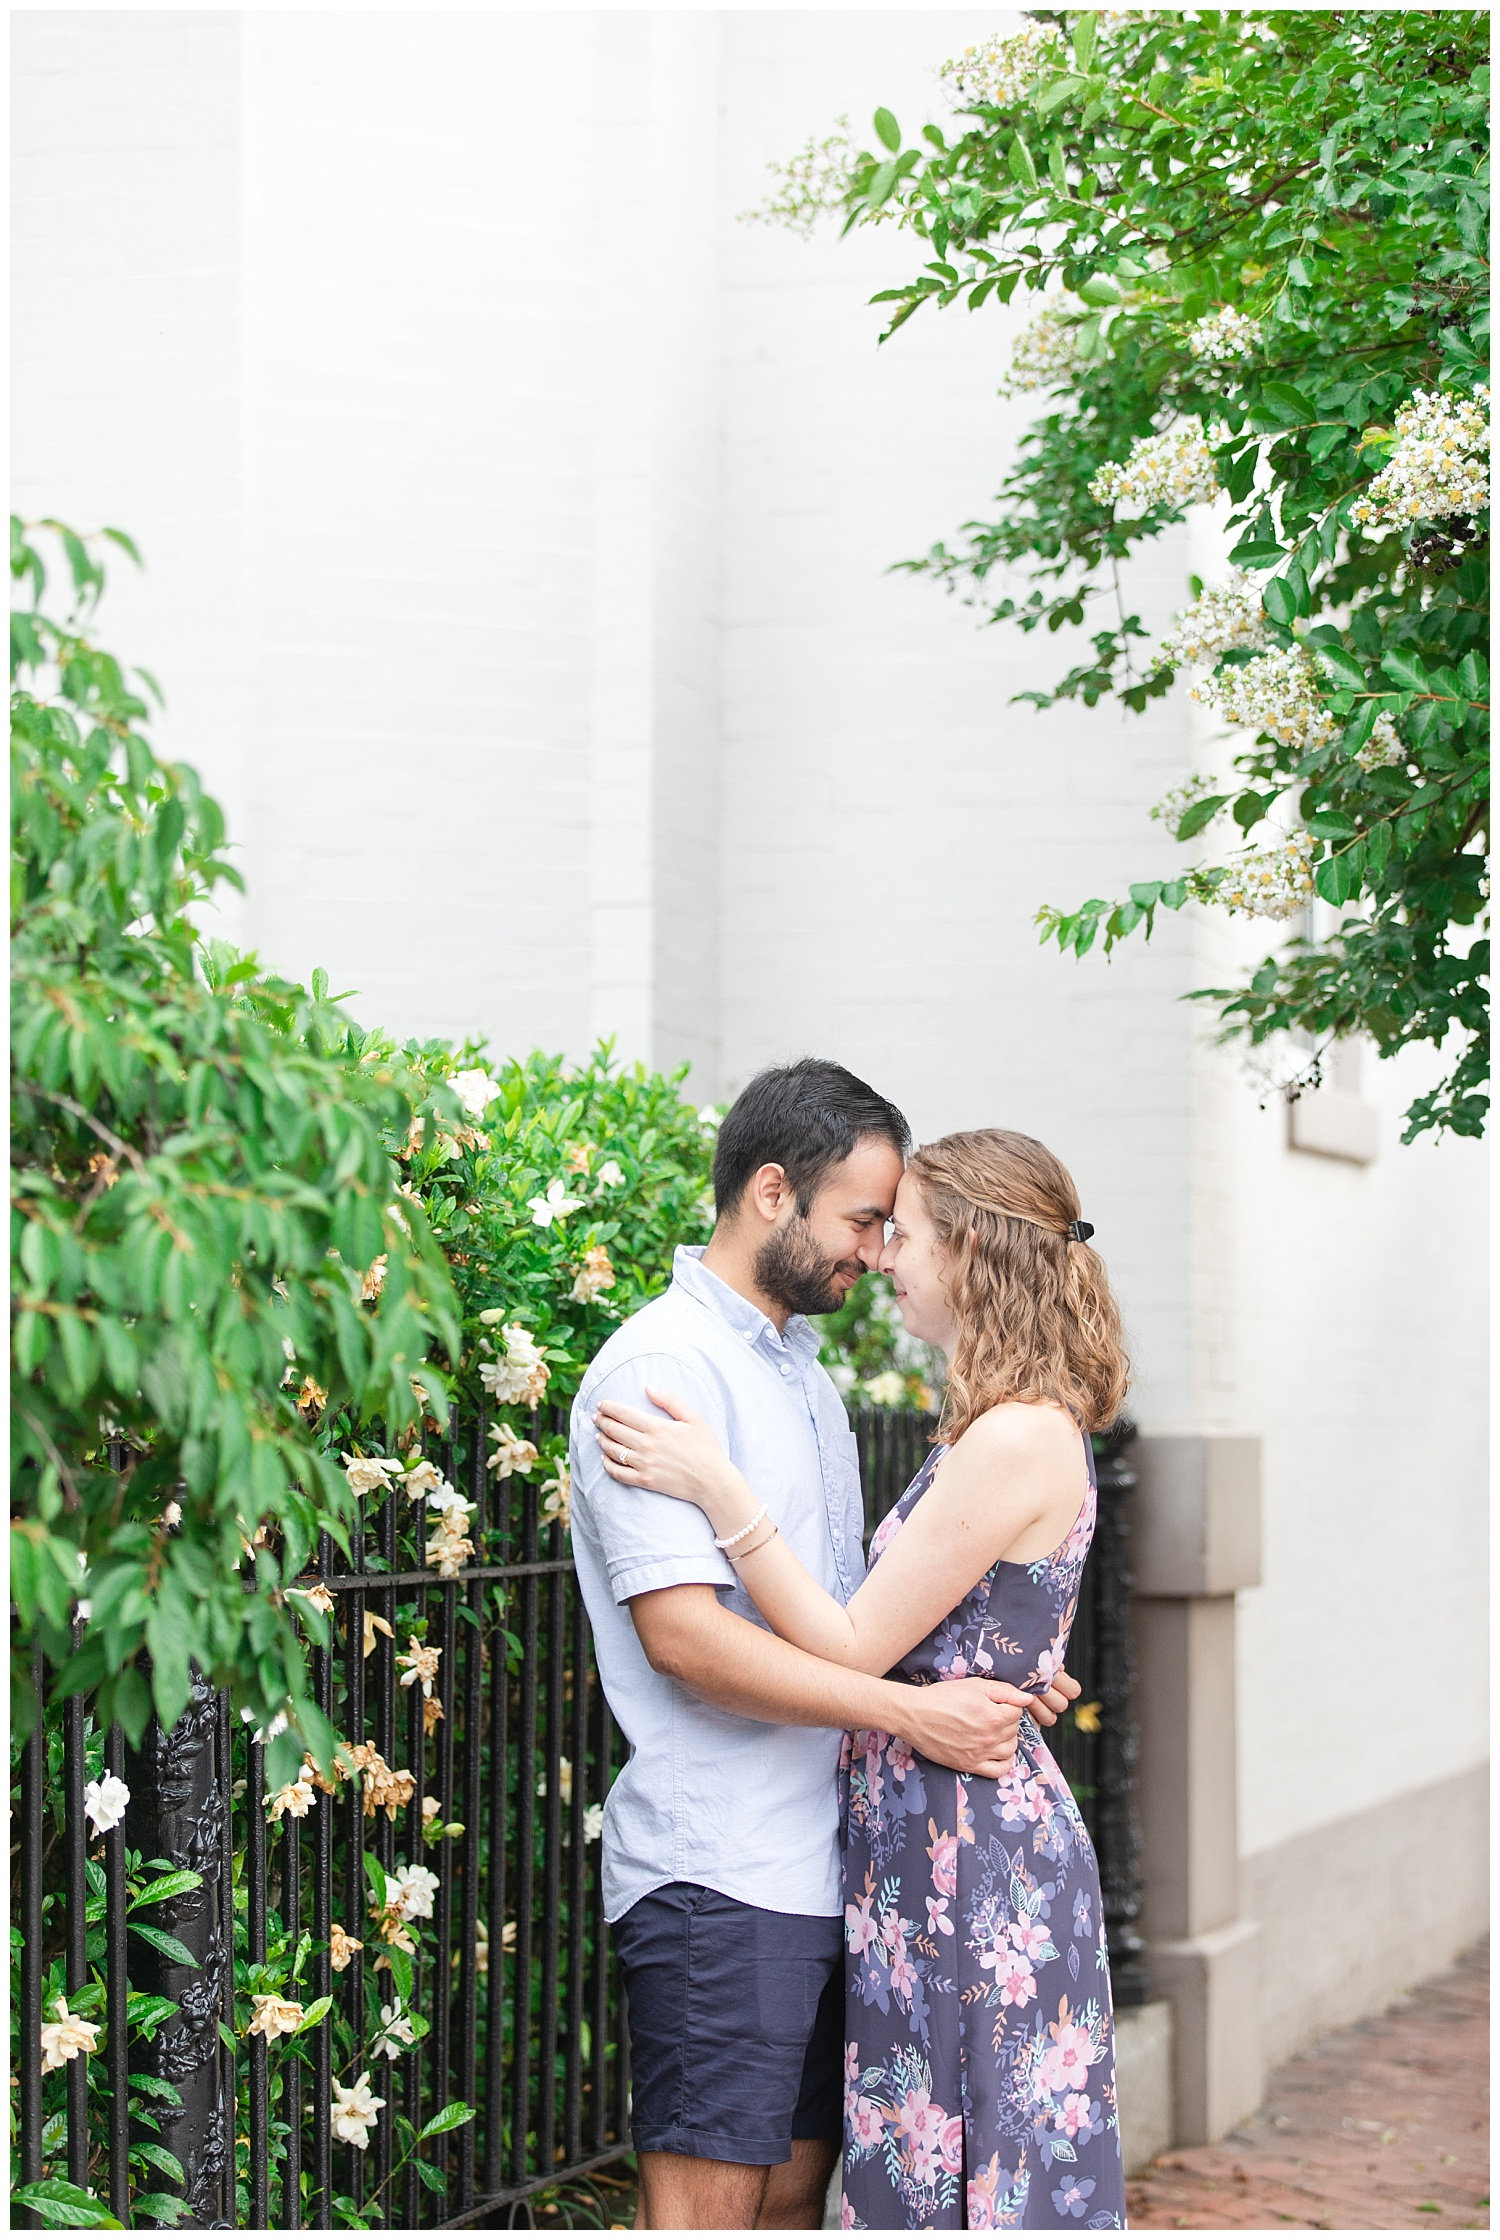 MJMP Richmond Wedding Photographer Libby Hill Park Engagement Photo_0010.jpg